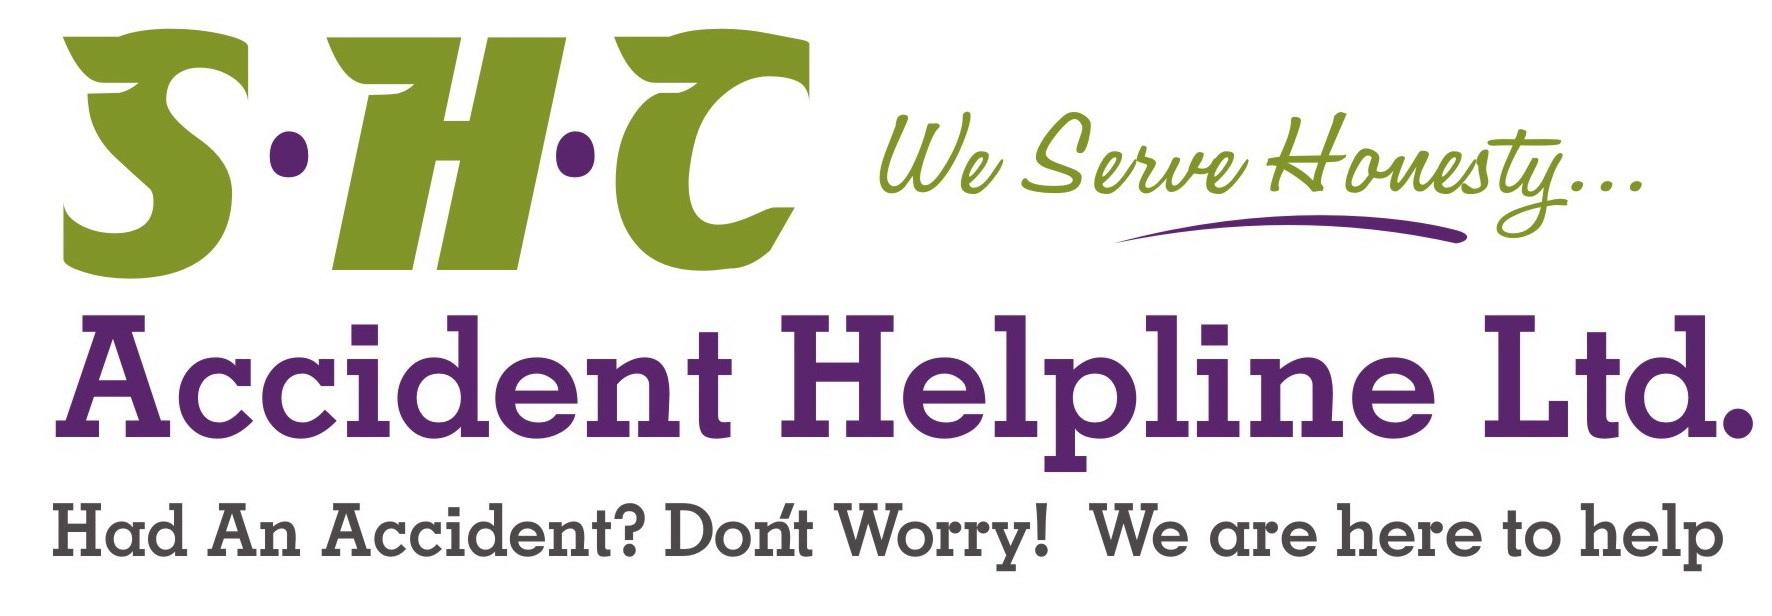 SHC Accident Helpline Ltd - London, London NW9 8UP - 03309 990111   ShowMeLocal.com